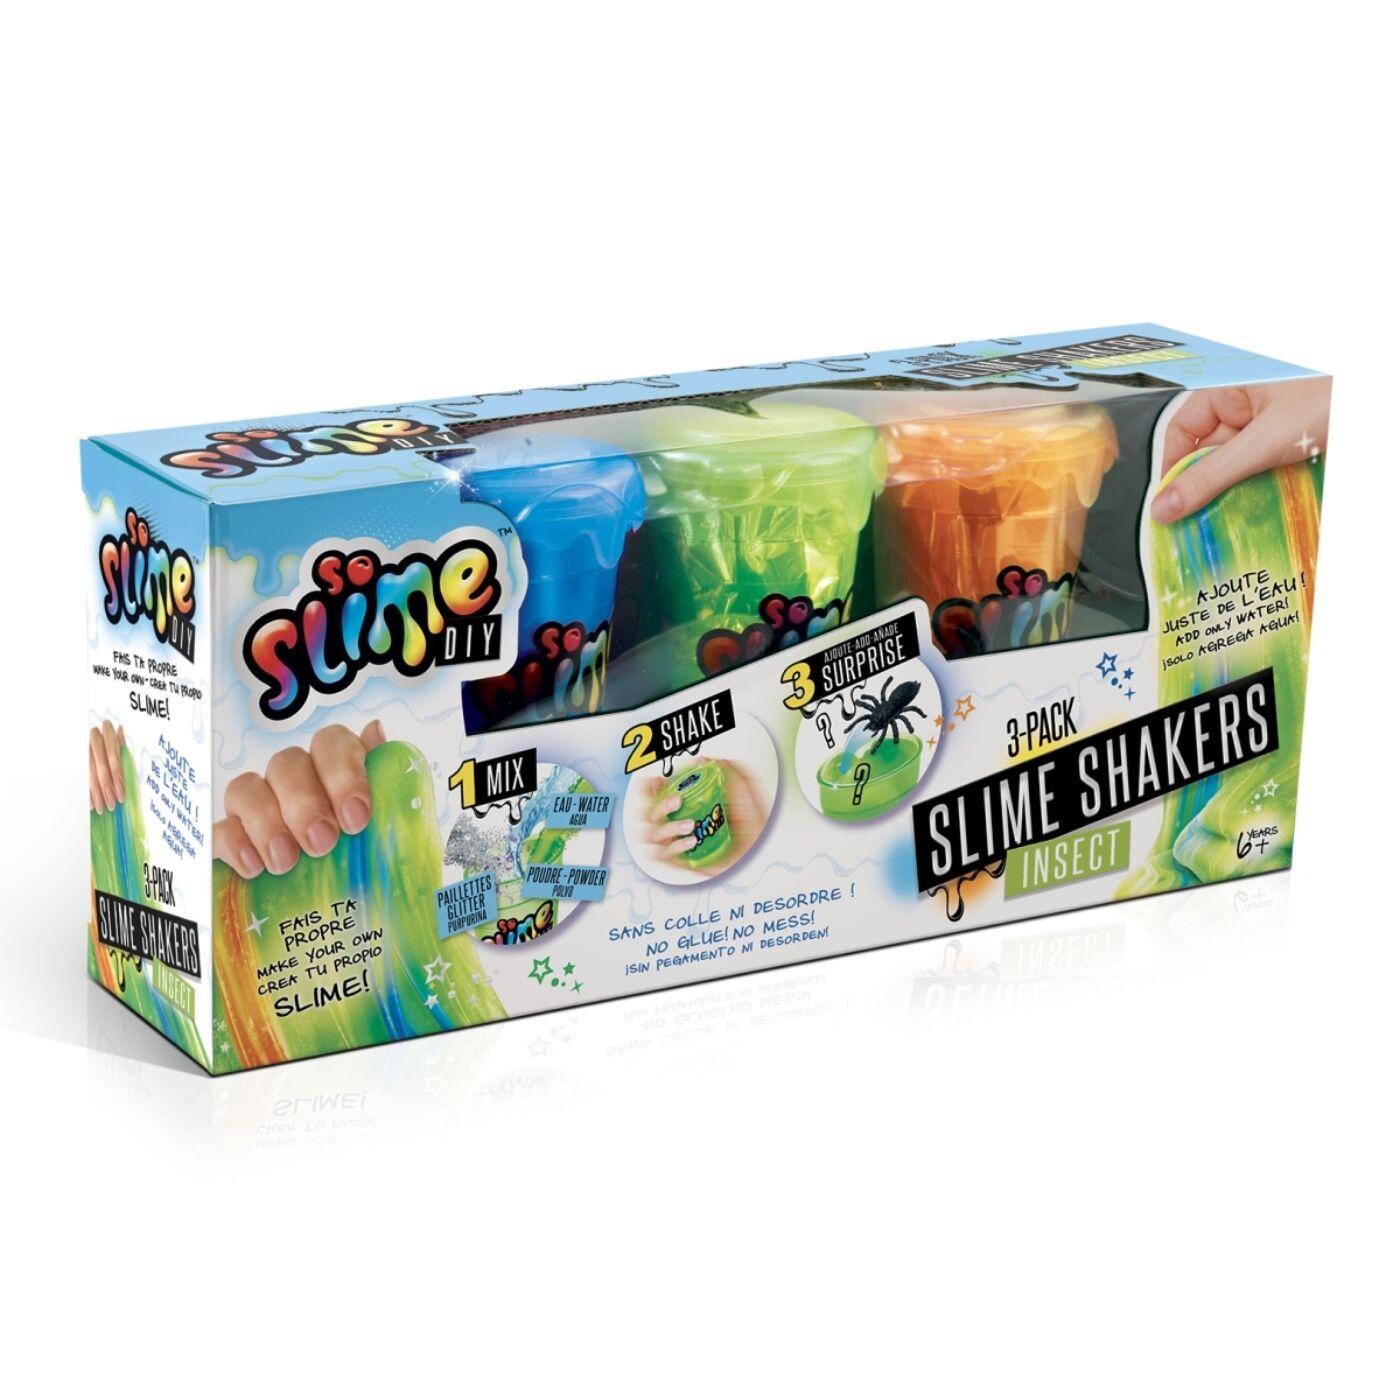 So Slime shakers